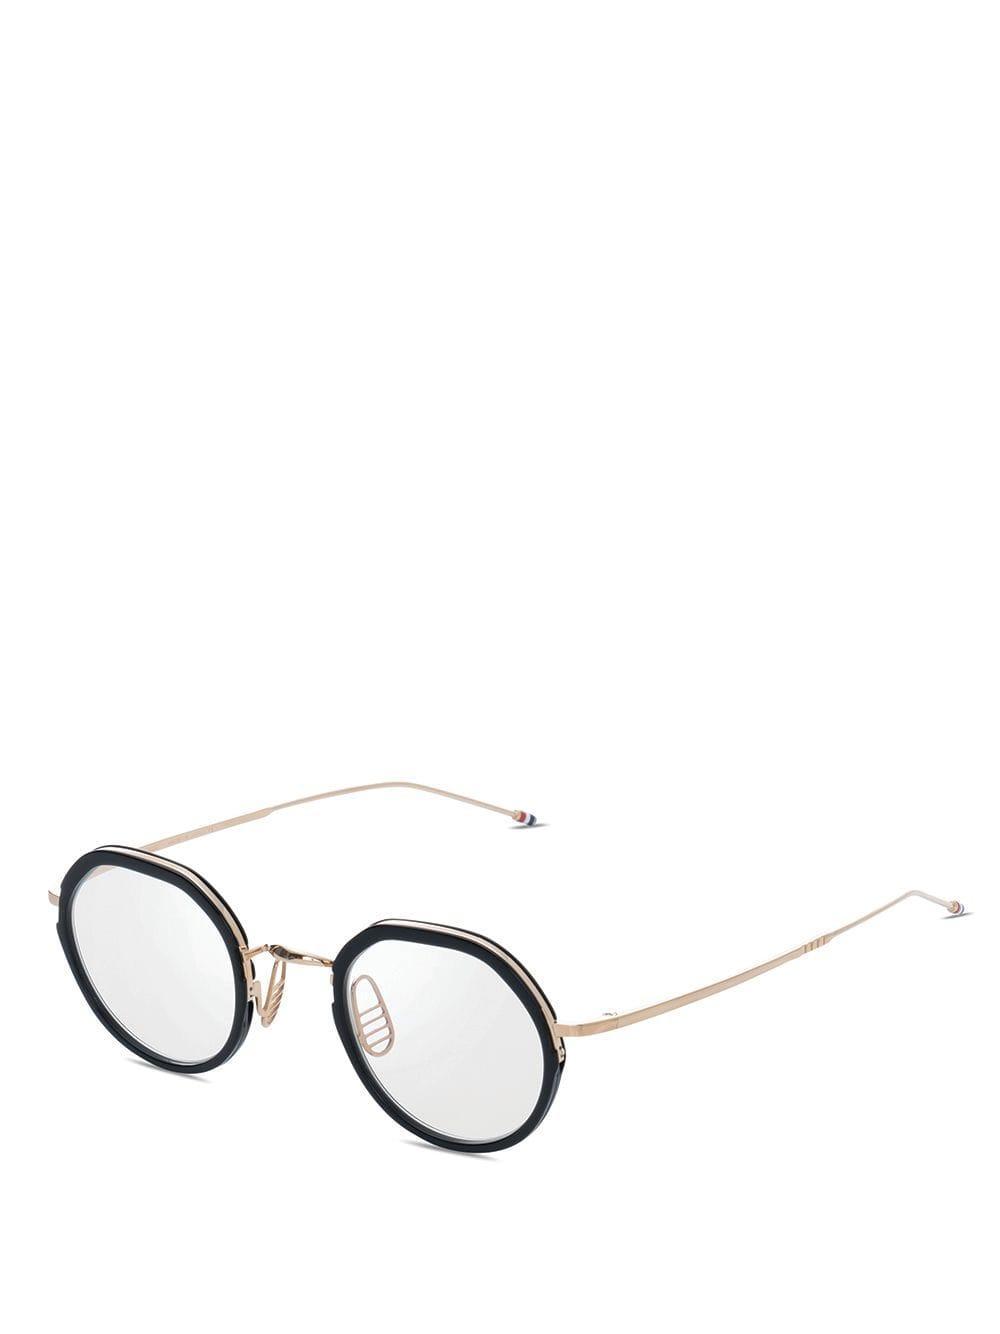 29b6b62625 Thom Browne Oval Frame Glasses in Black for Men - Lyst